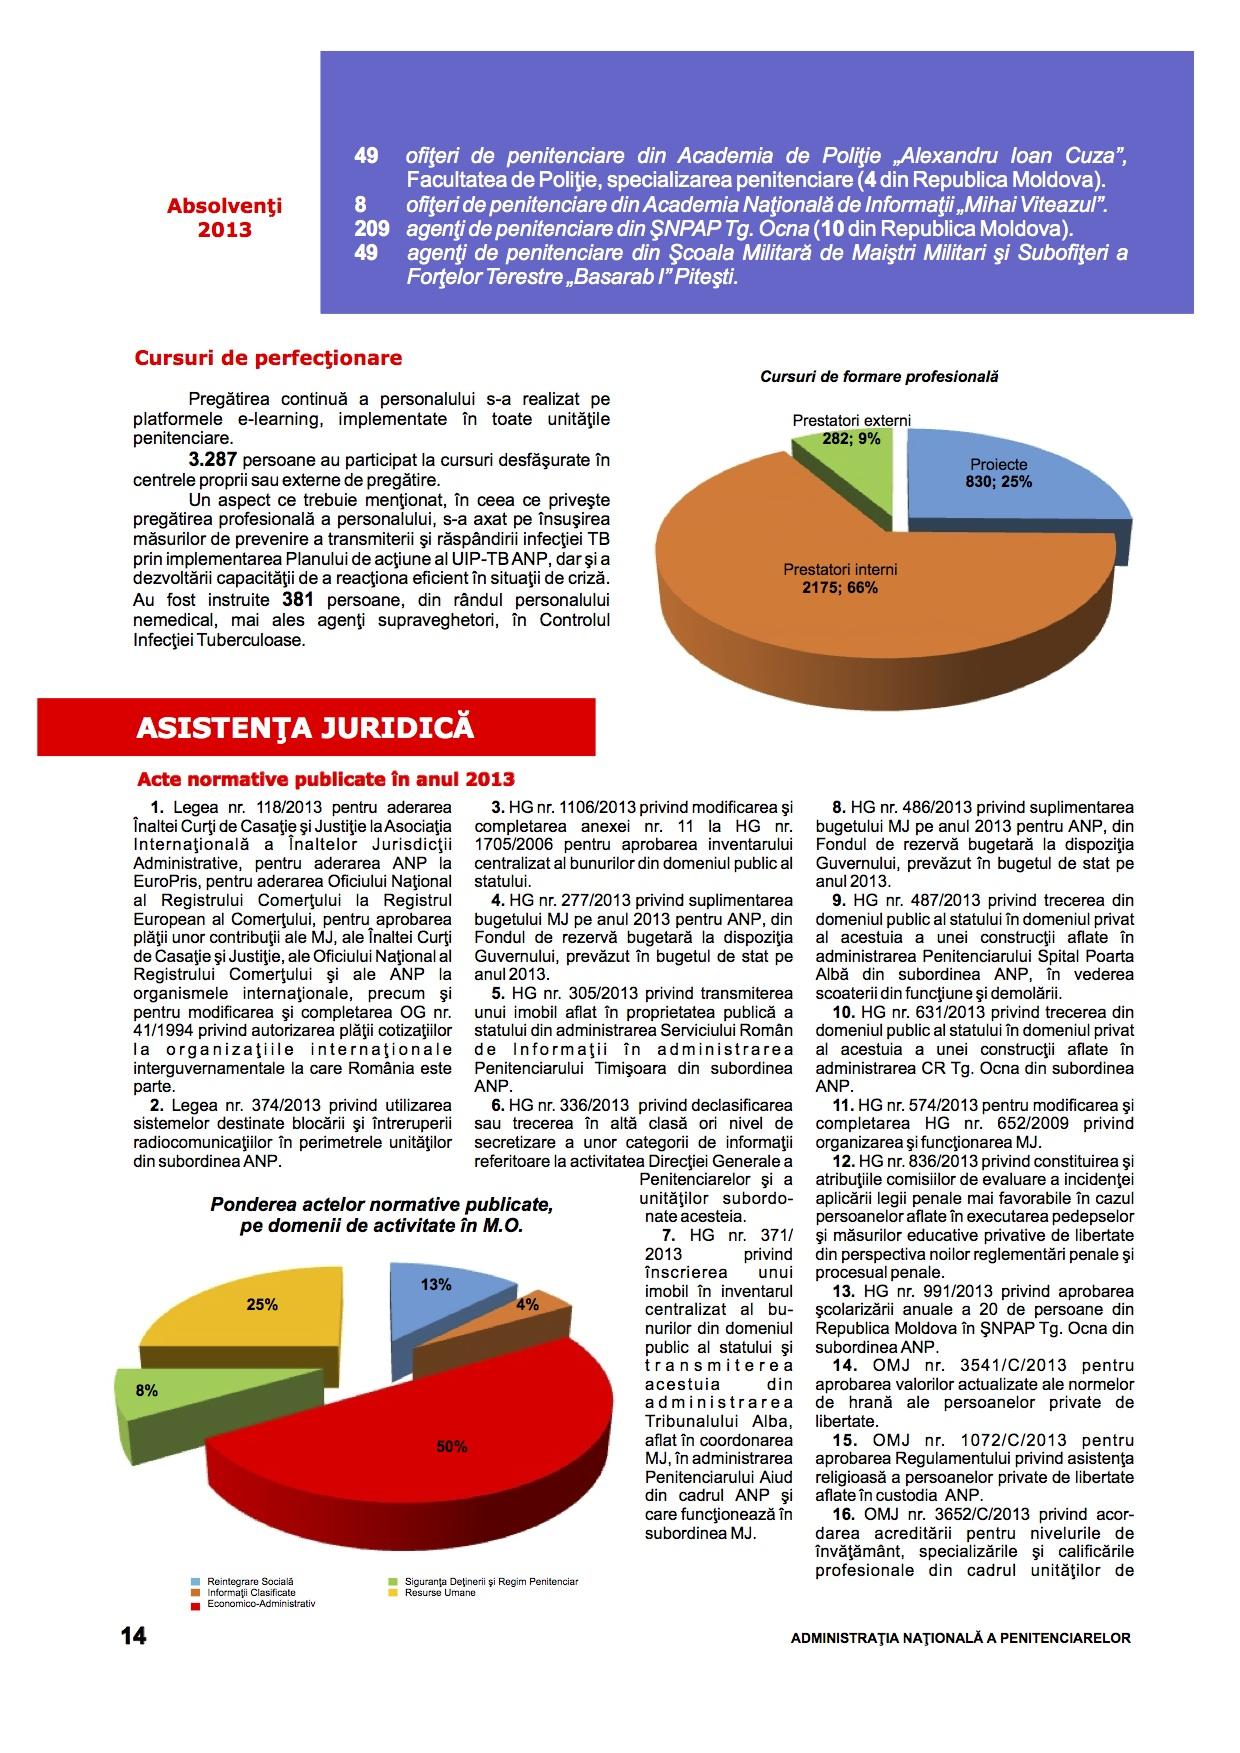 bilant 2013pg14